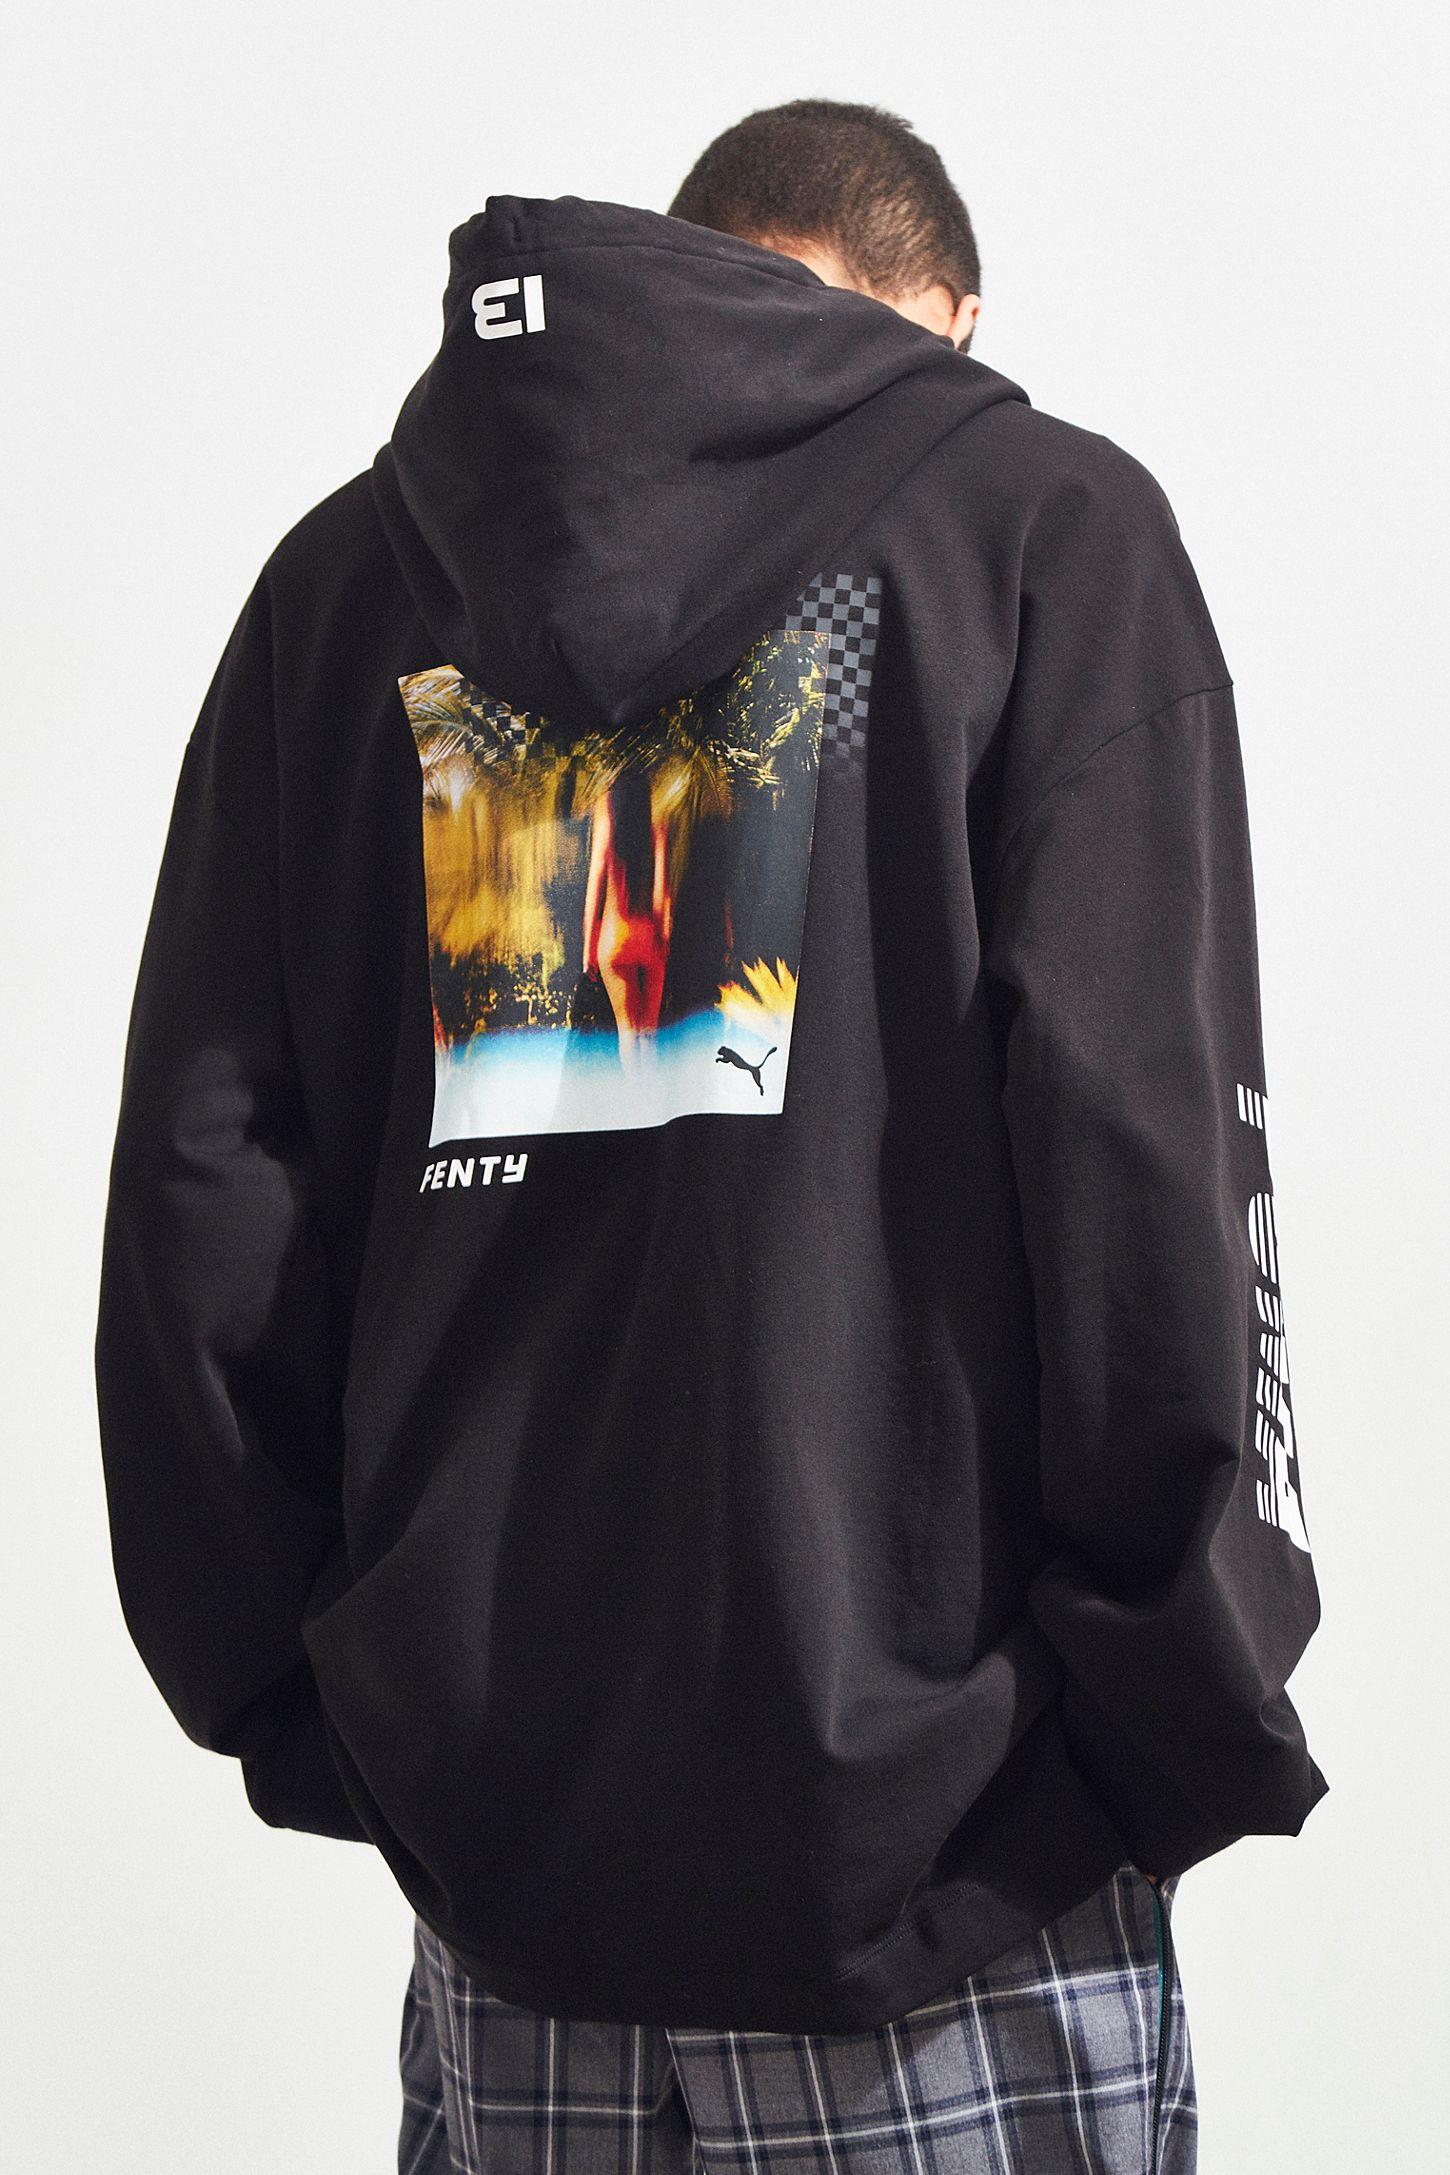 c93d256b3d18 Puma Fenty By Rihanna Graphic Hoodie Sweatshirt